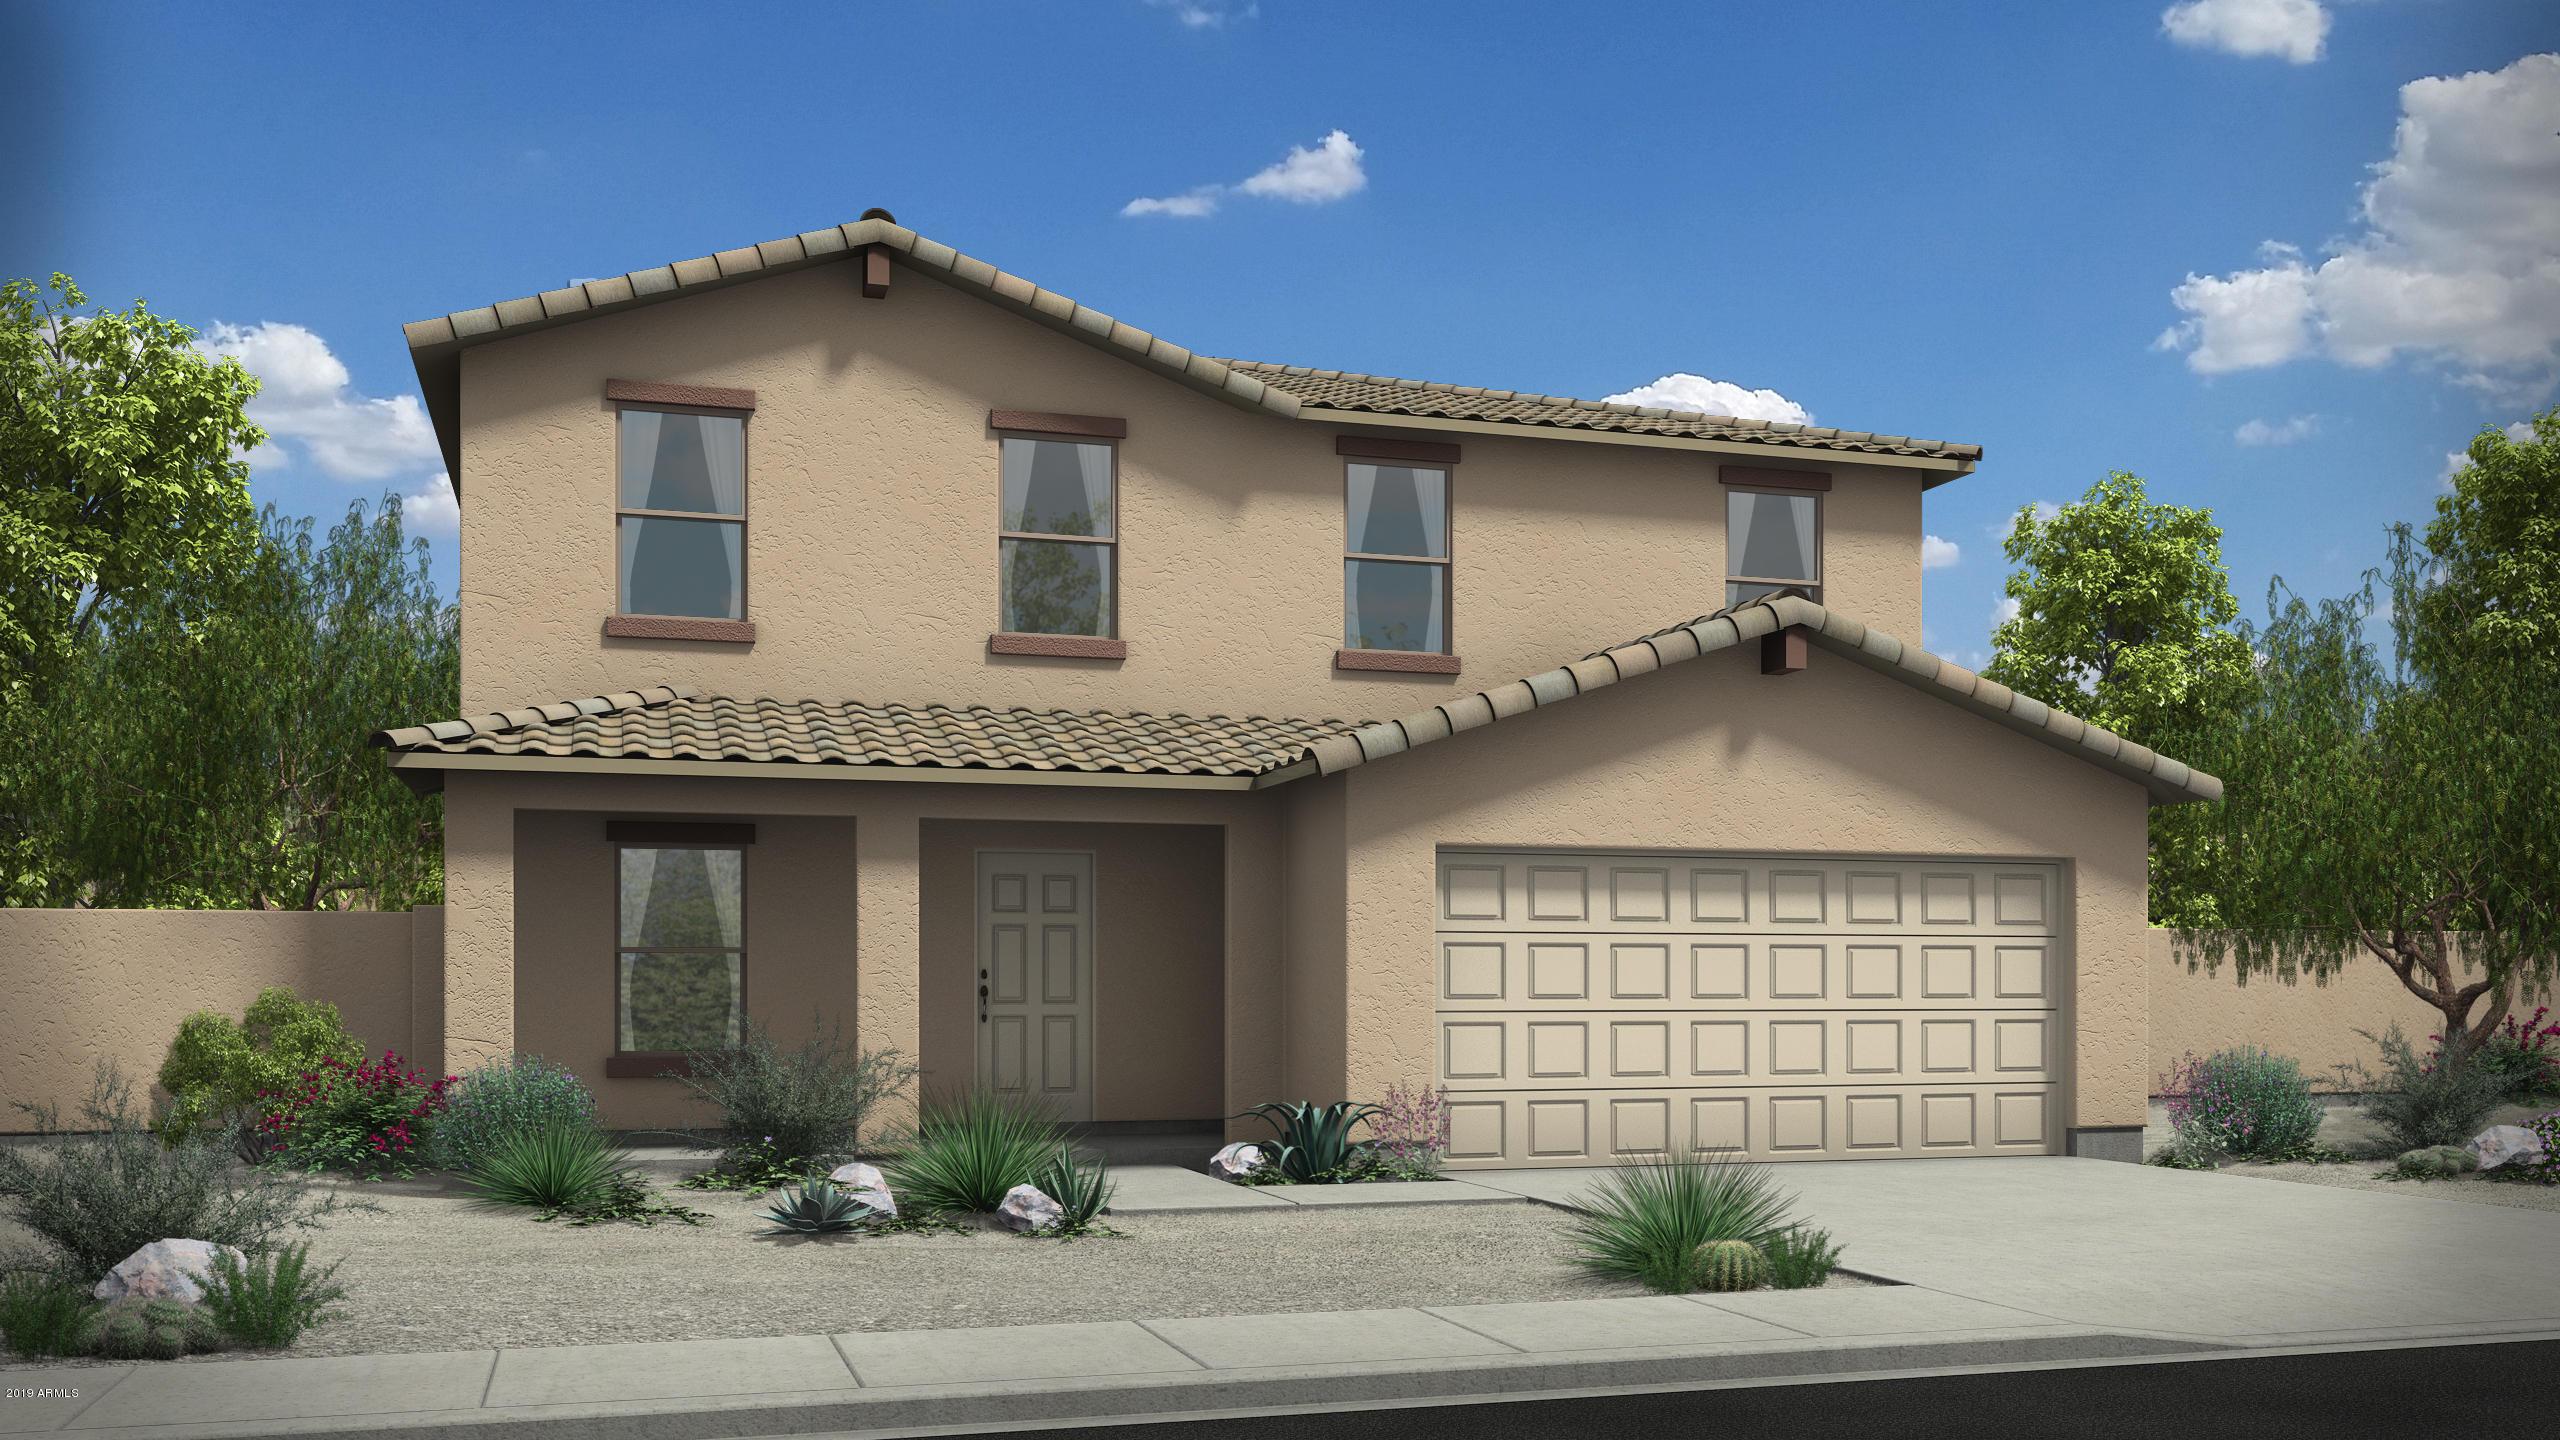 Photo of 226 W IMPALA Place, Casa Grande, AZ 85122